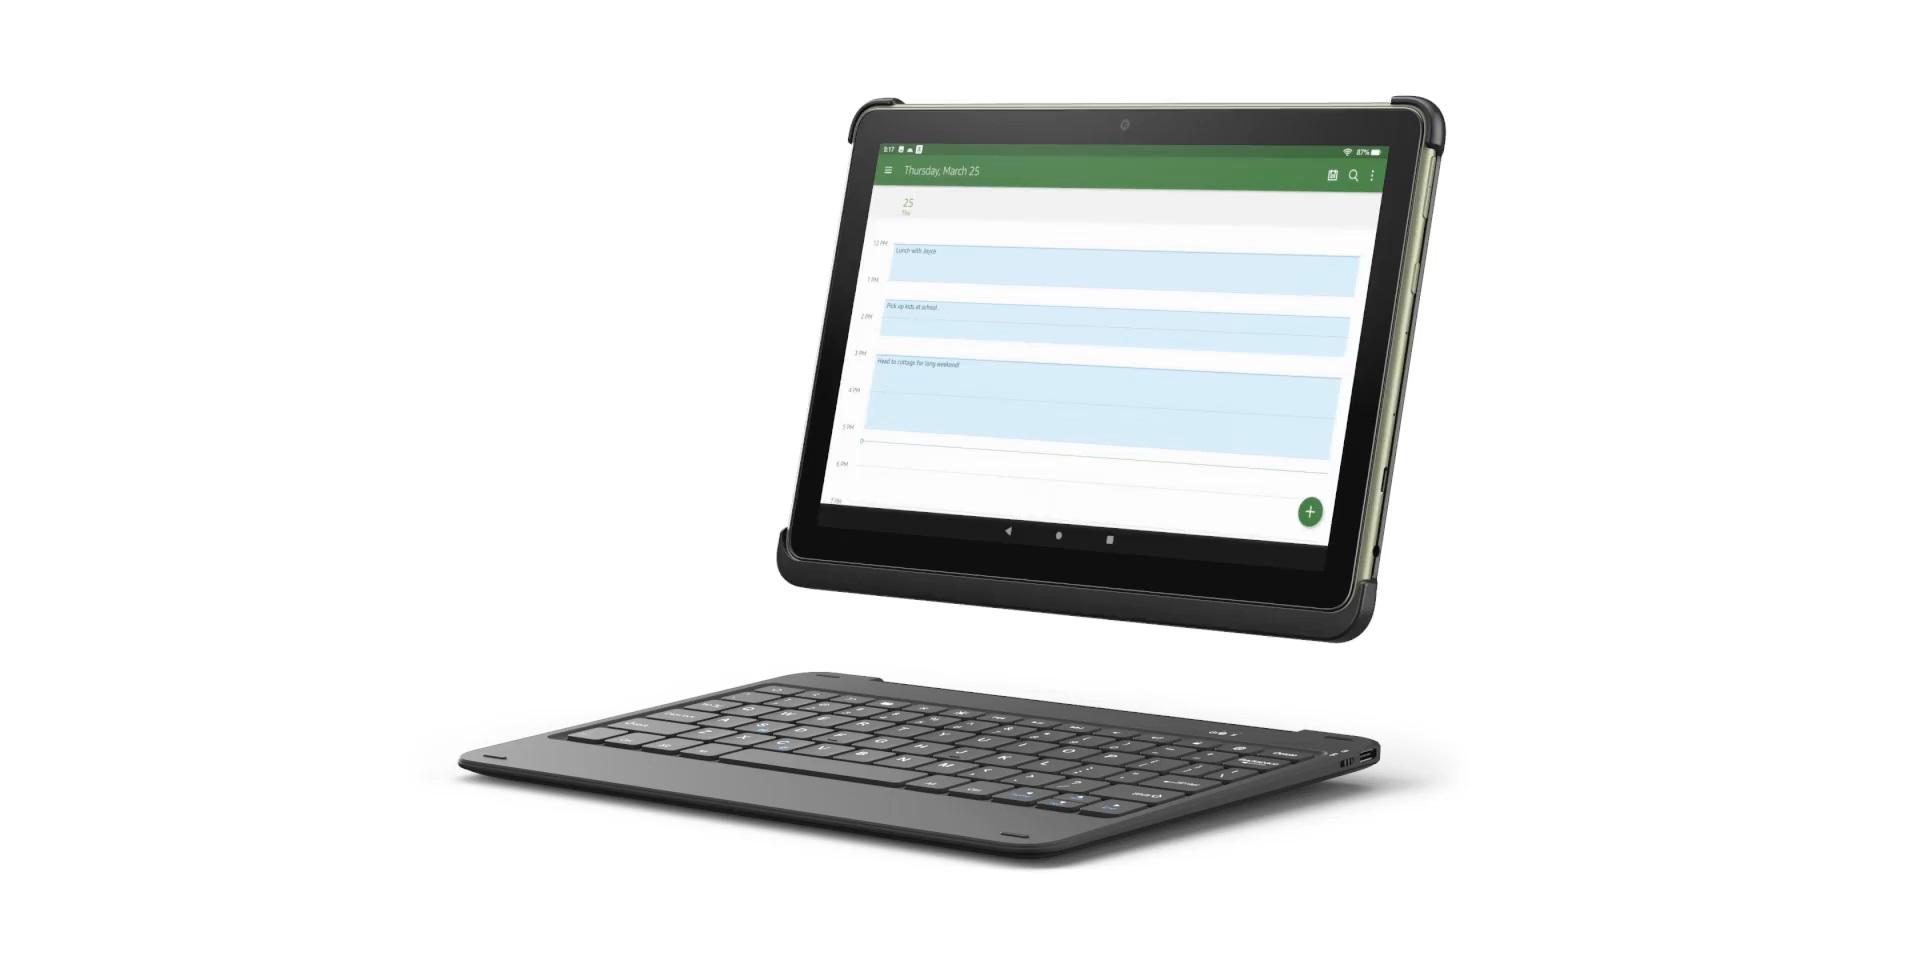 All-new Fire HD 10 tablet, 10.1, 1080p Full HD, 32 GB, latest model (2021 release), Black